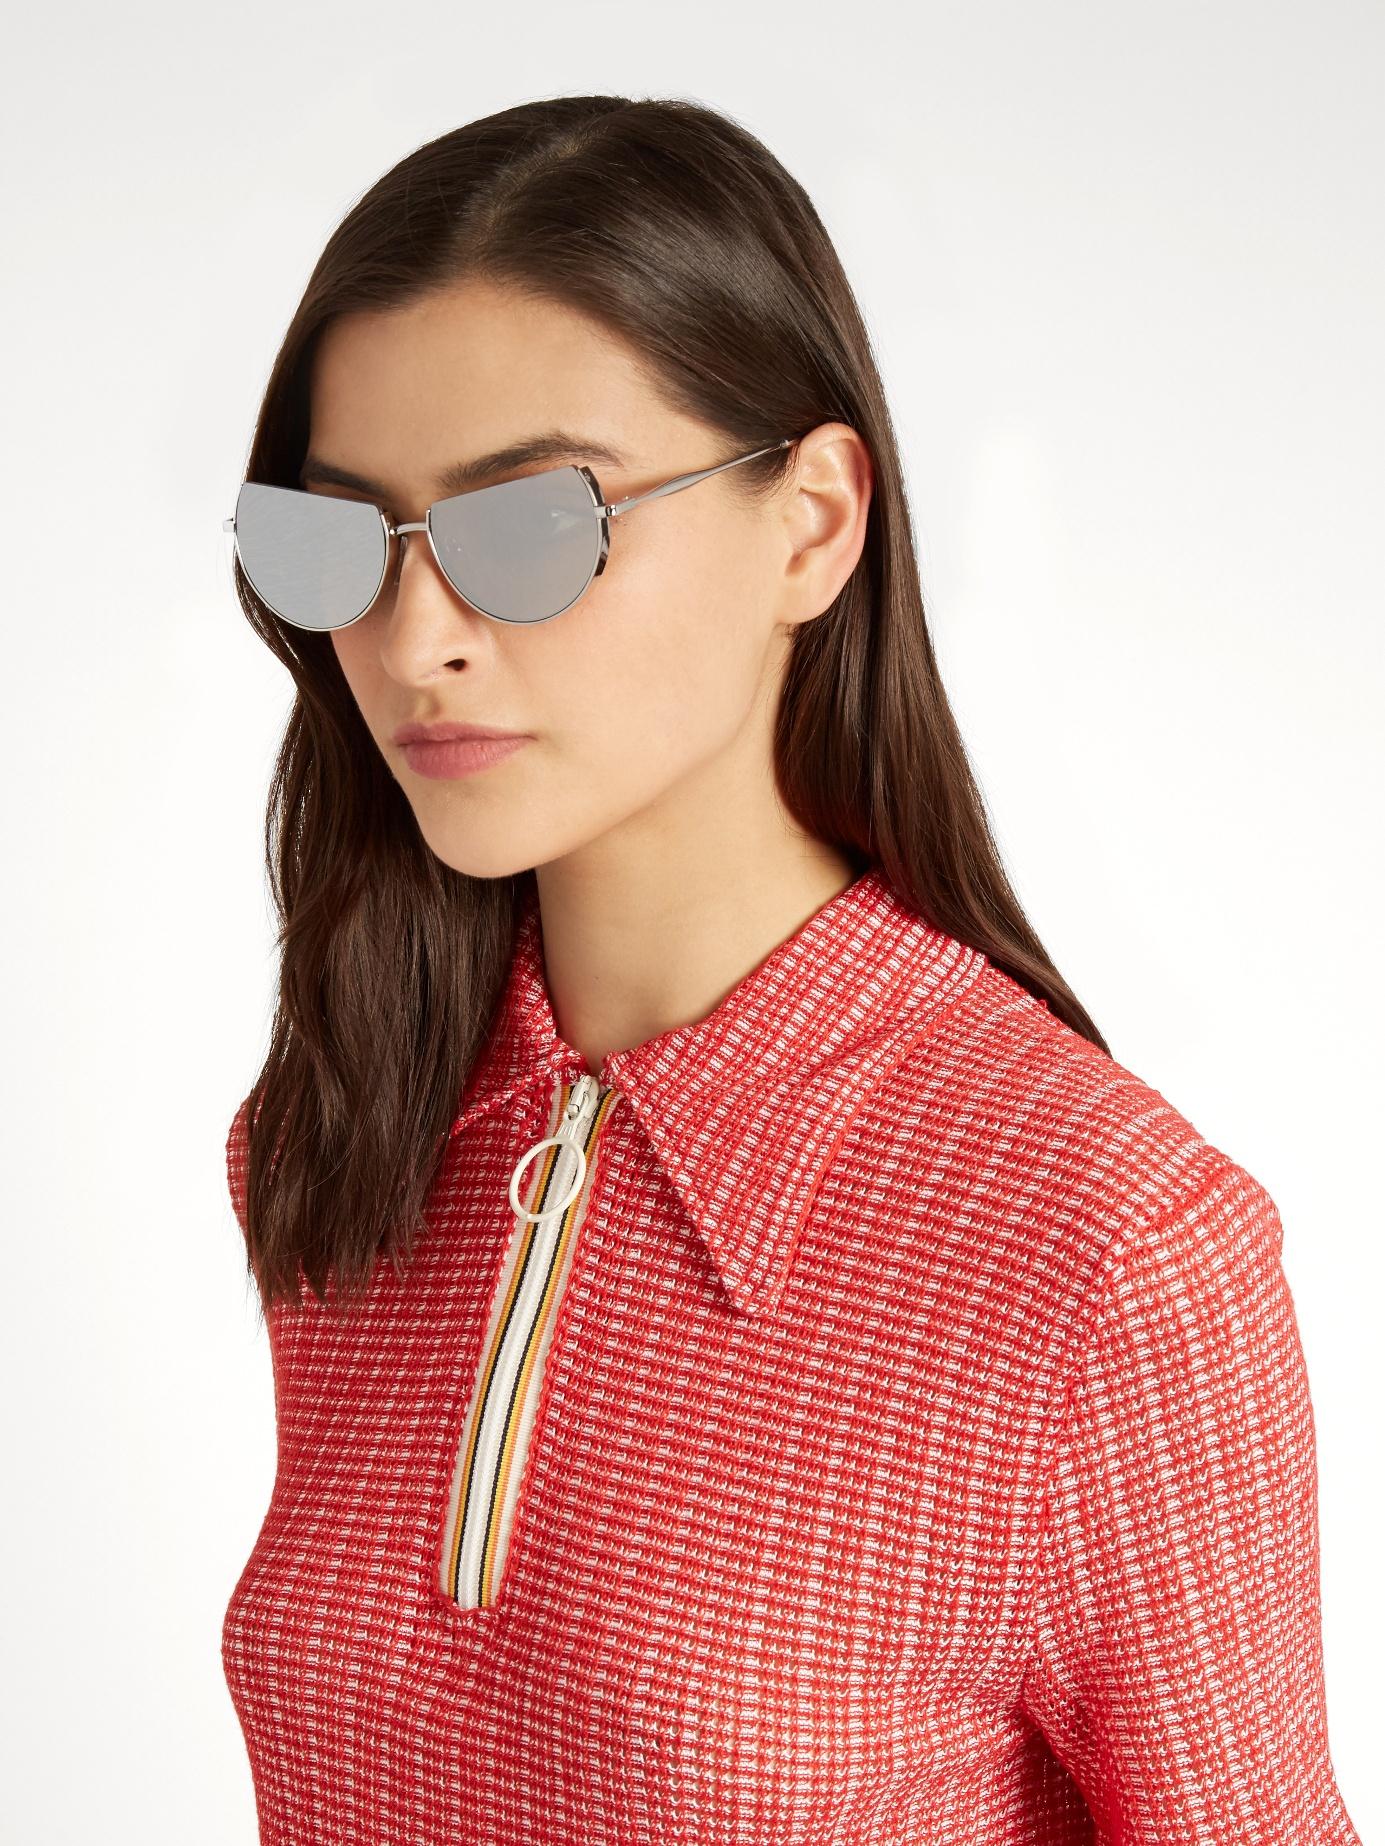 The Reflective Sunglasses